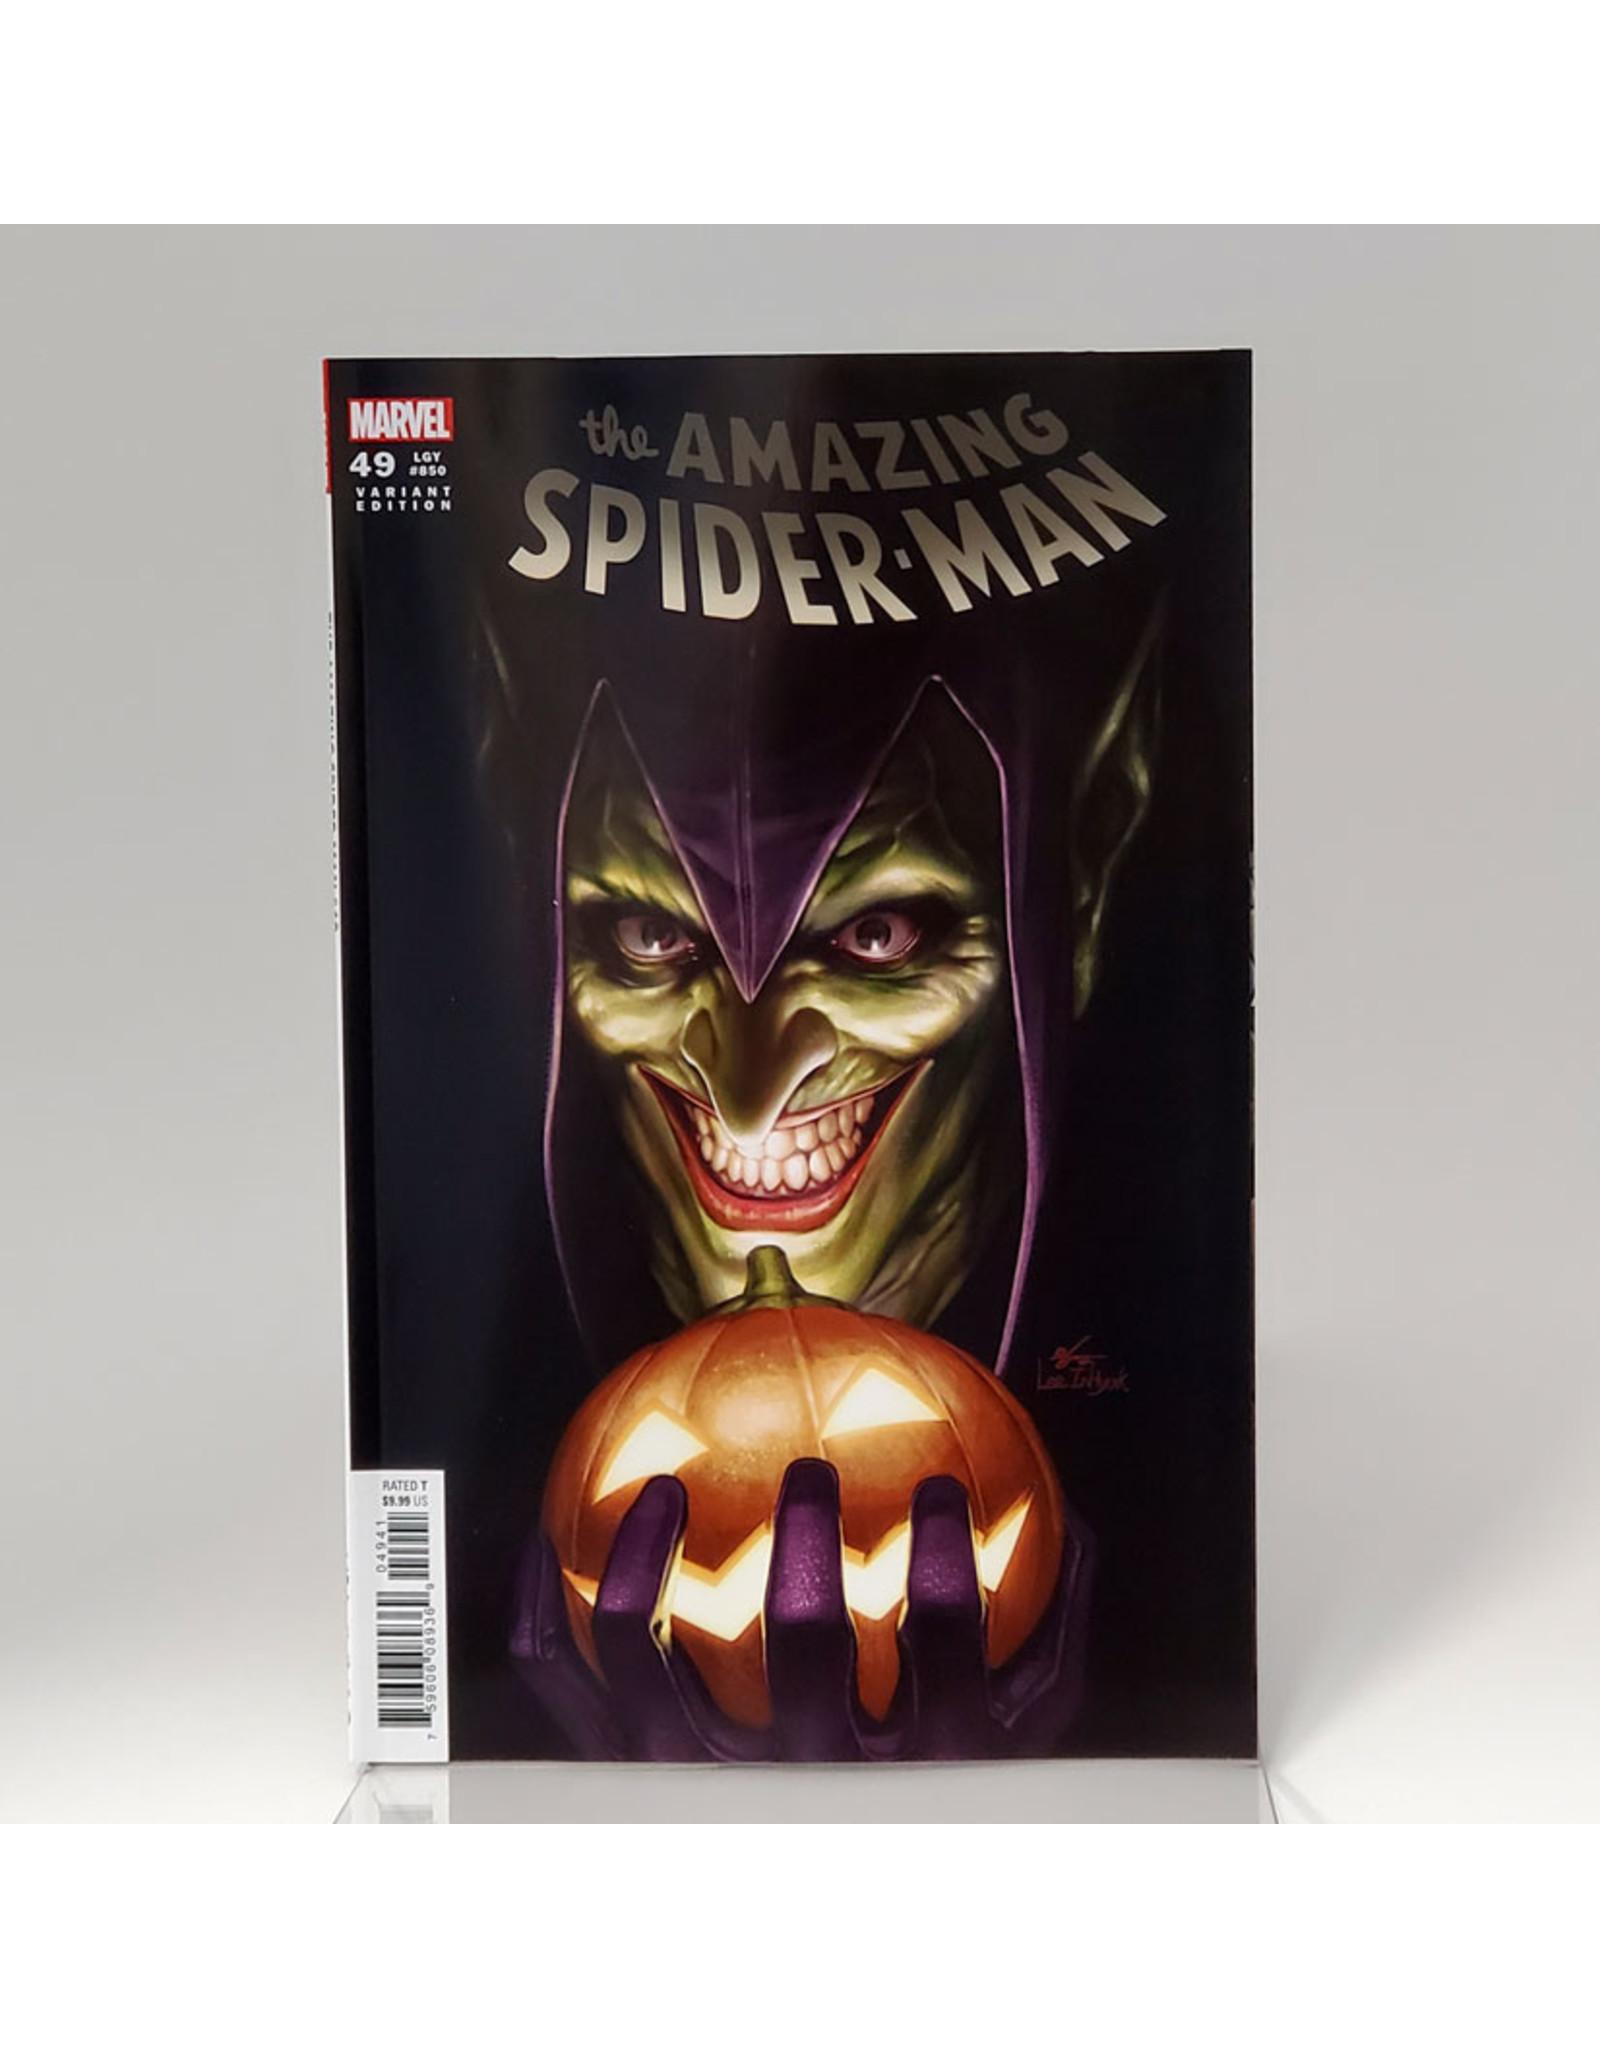 MARVEL COMICS AMAZING SPIDER-MAN #49 1:25 INHYUK LEE VAR